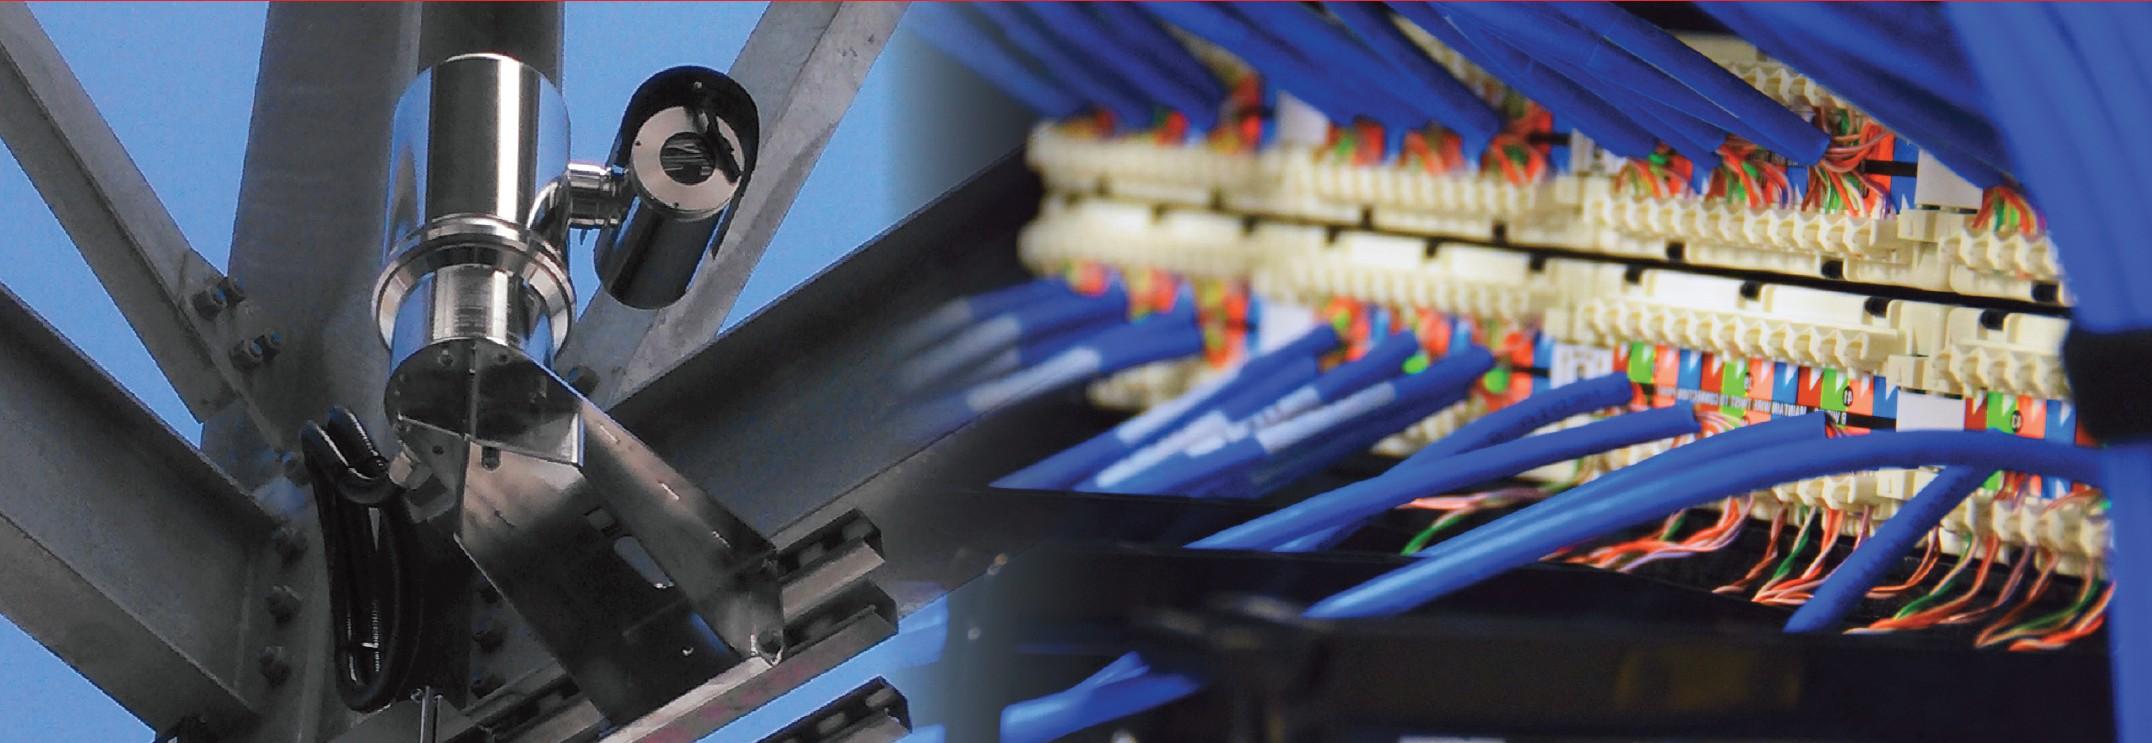 Super Ncs Network Cabling Services Inc Linkedin Wiring Cloud Aboleophagdienstapotheekhoekschewaardnl